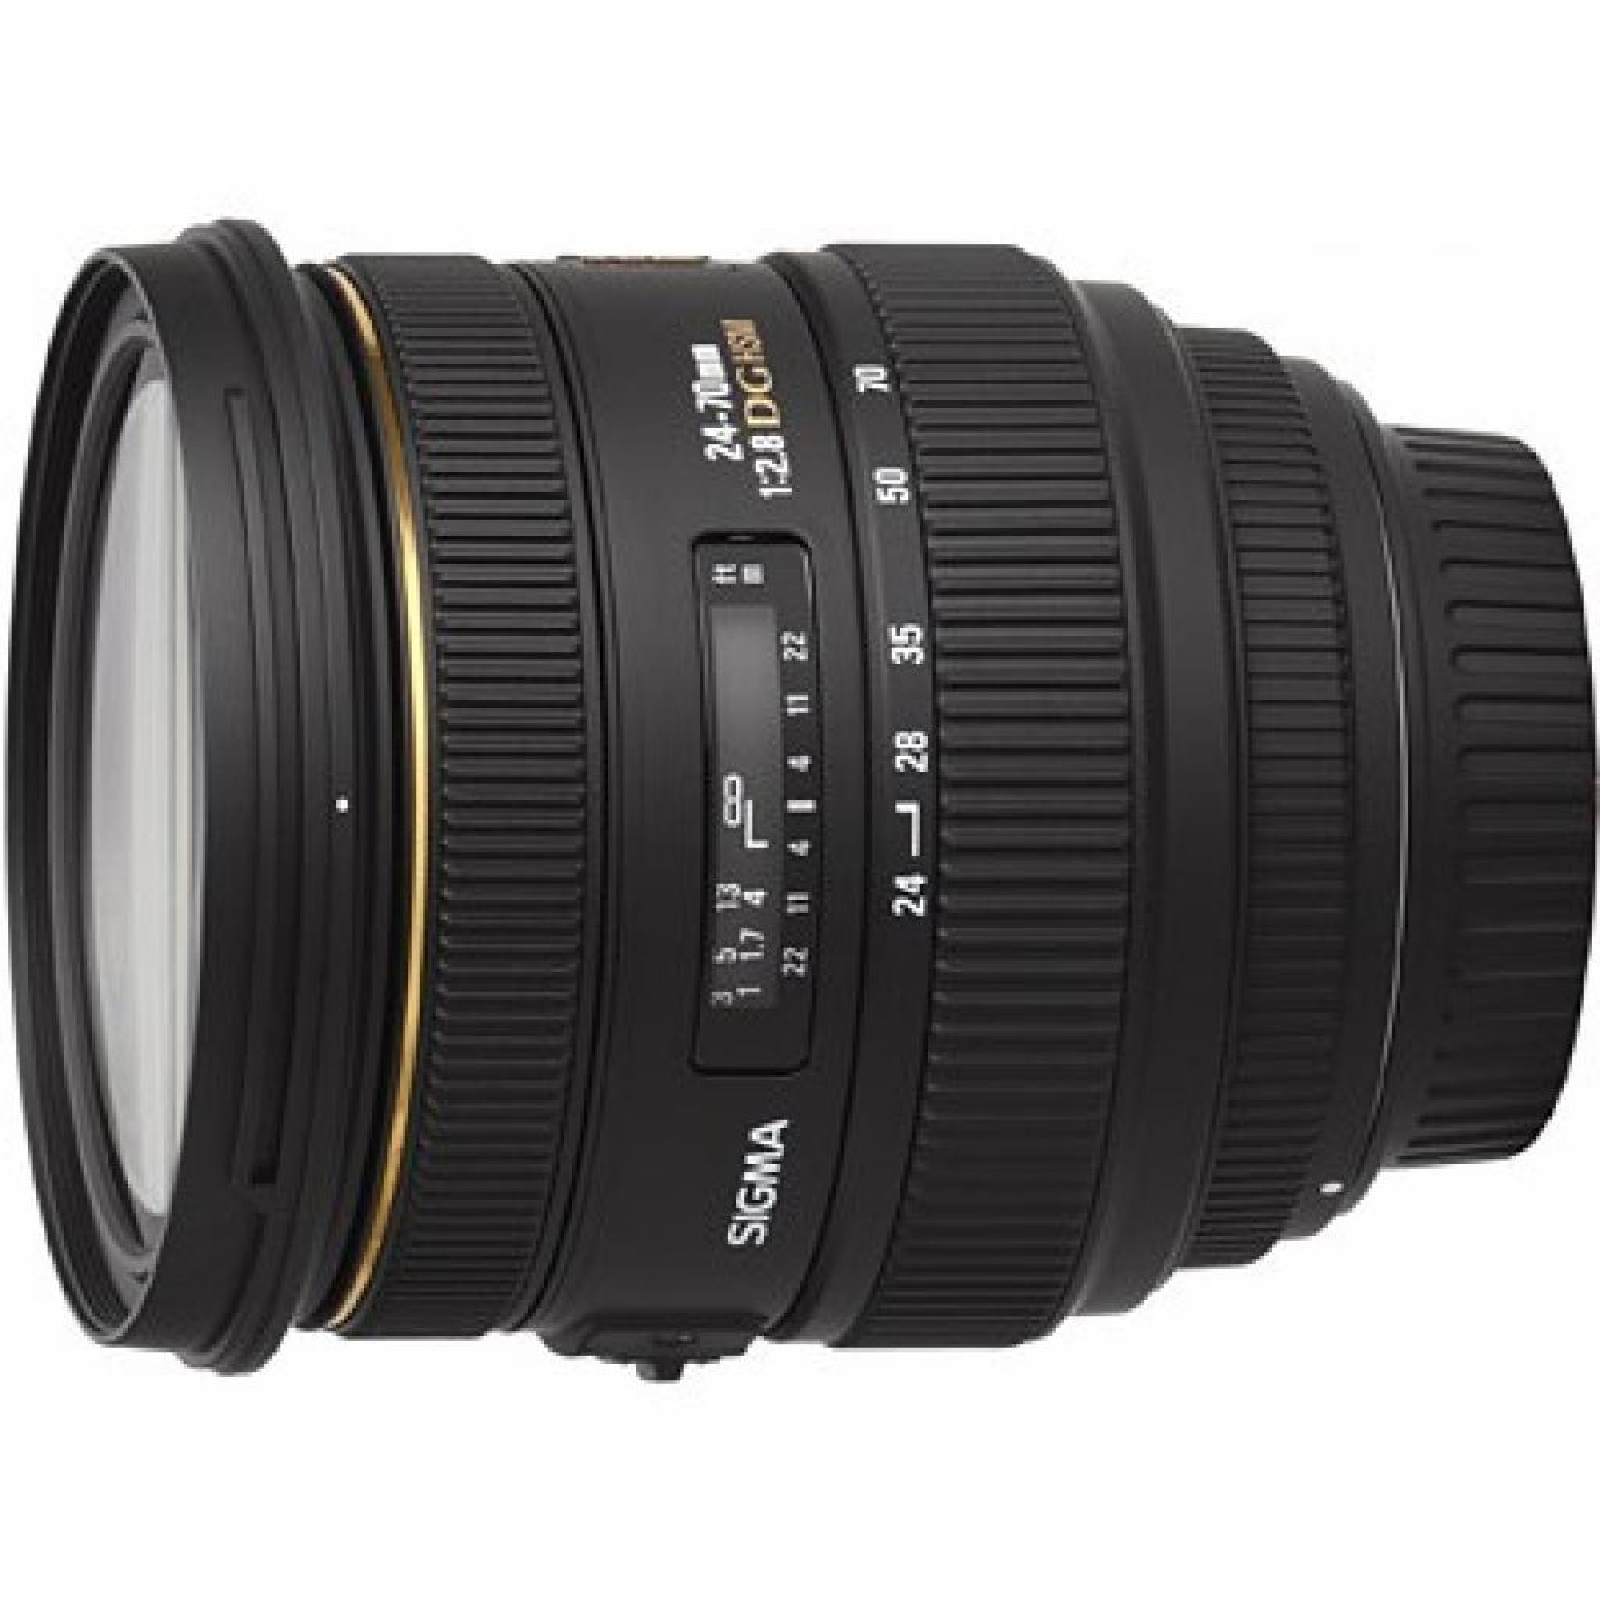 Объектив Sigma 24-70mm f/2.8 EX DG HSM for Canon (571954)